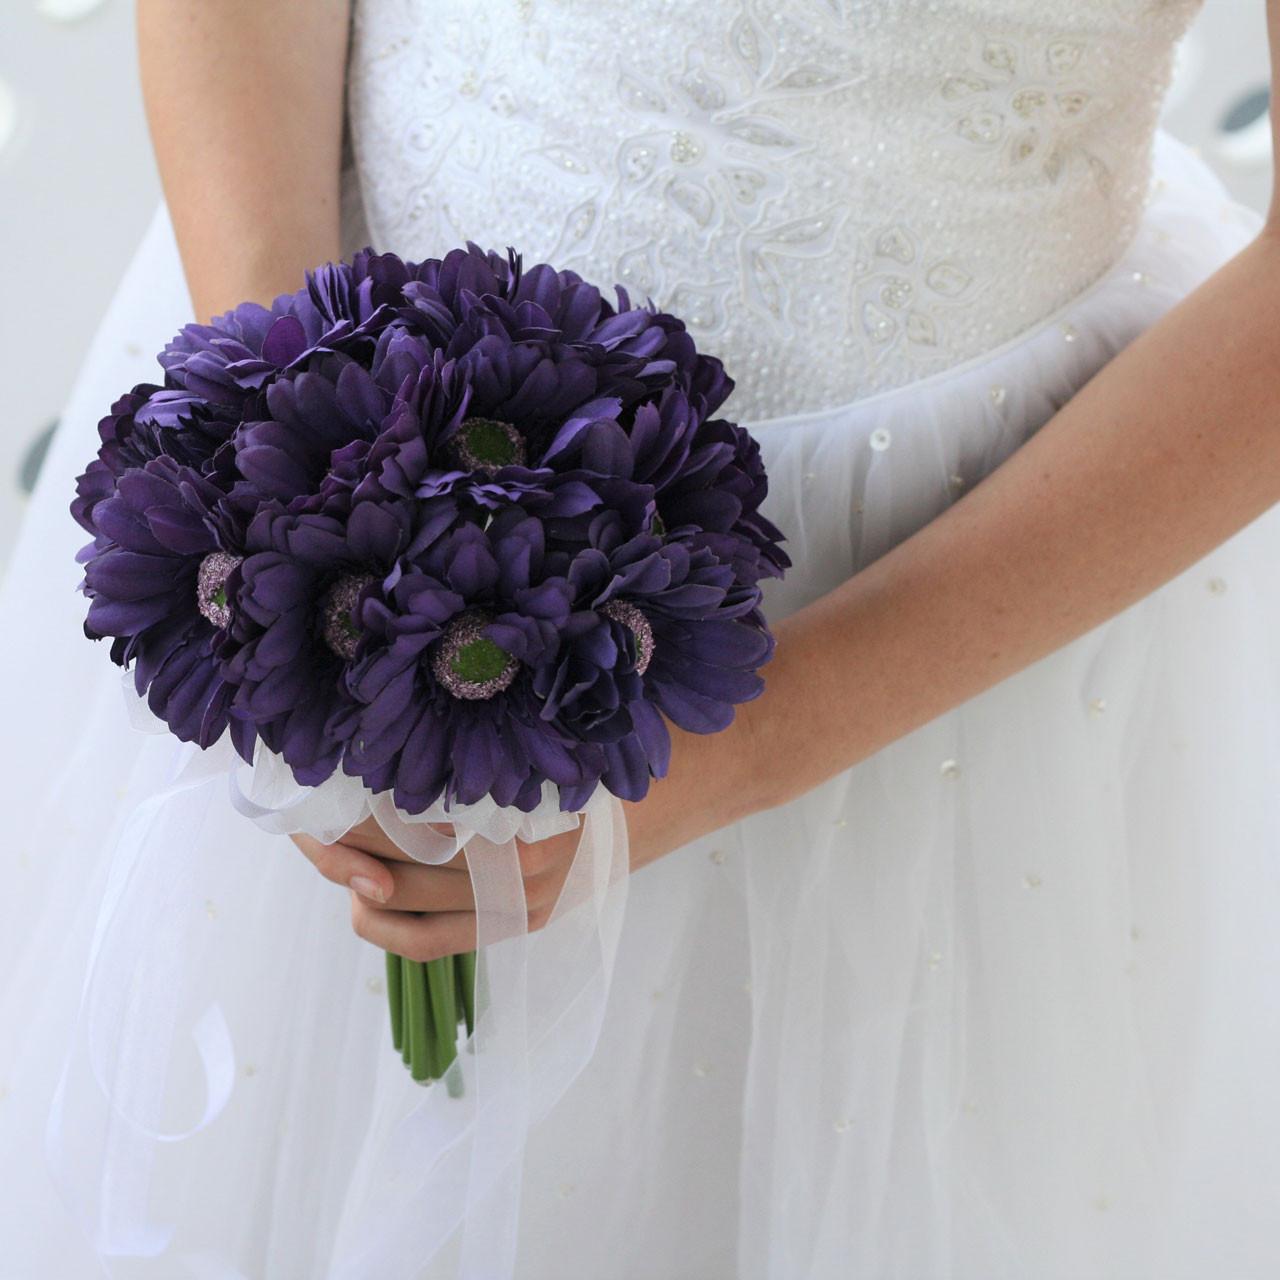 Bride Artificial Rose Bouquet Silk Flower Bunch Party Wedding Decors Purple